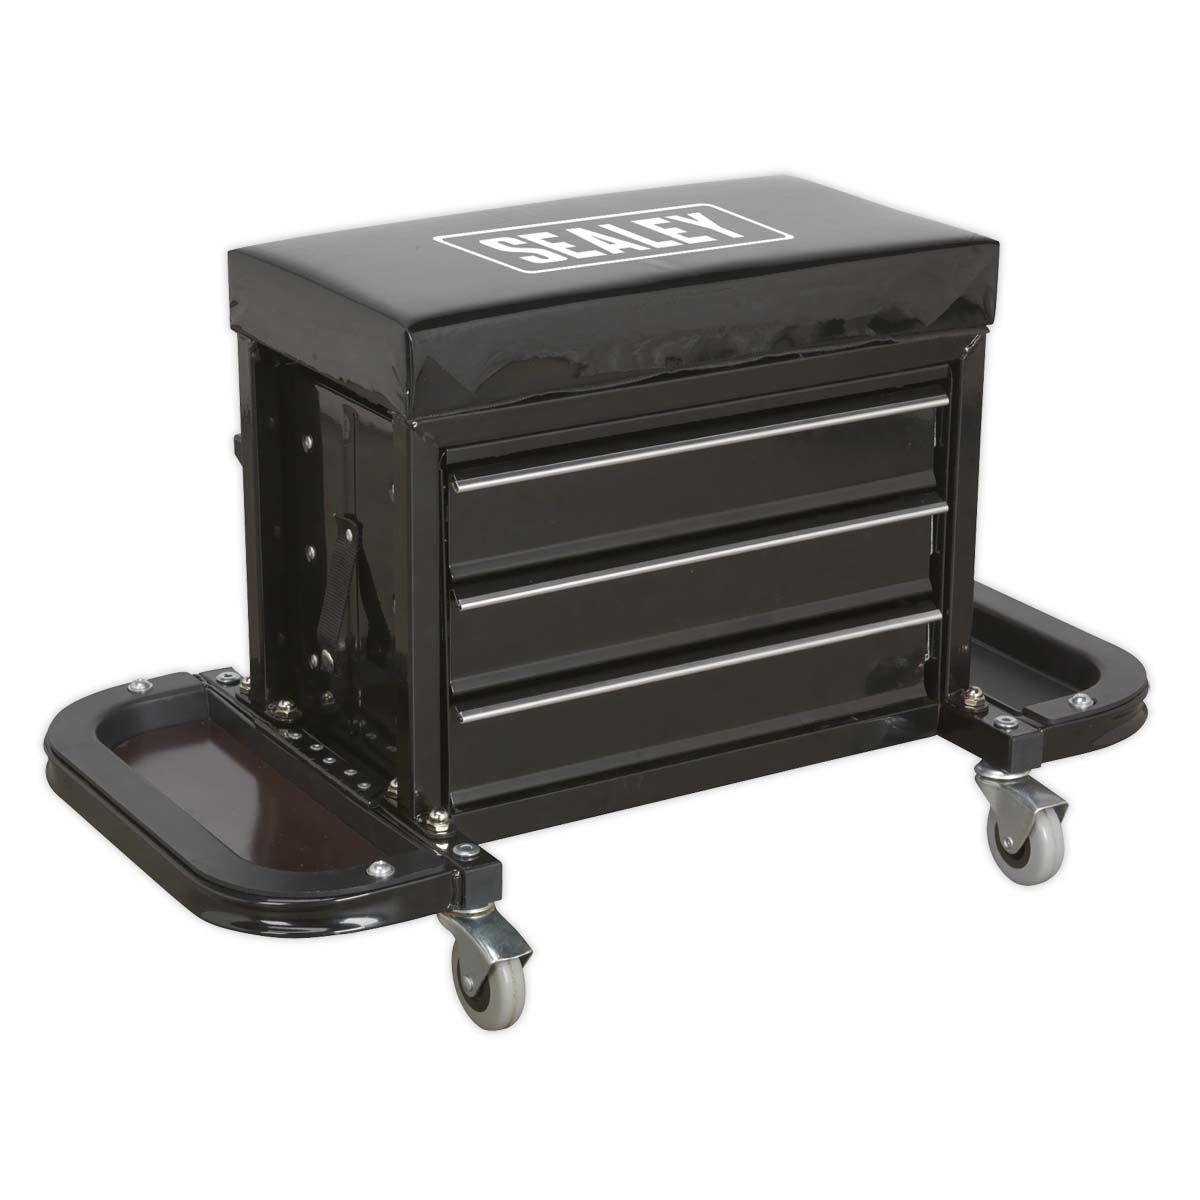 Sealey Mechanic's Utility Seat & Toolbox